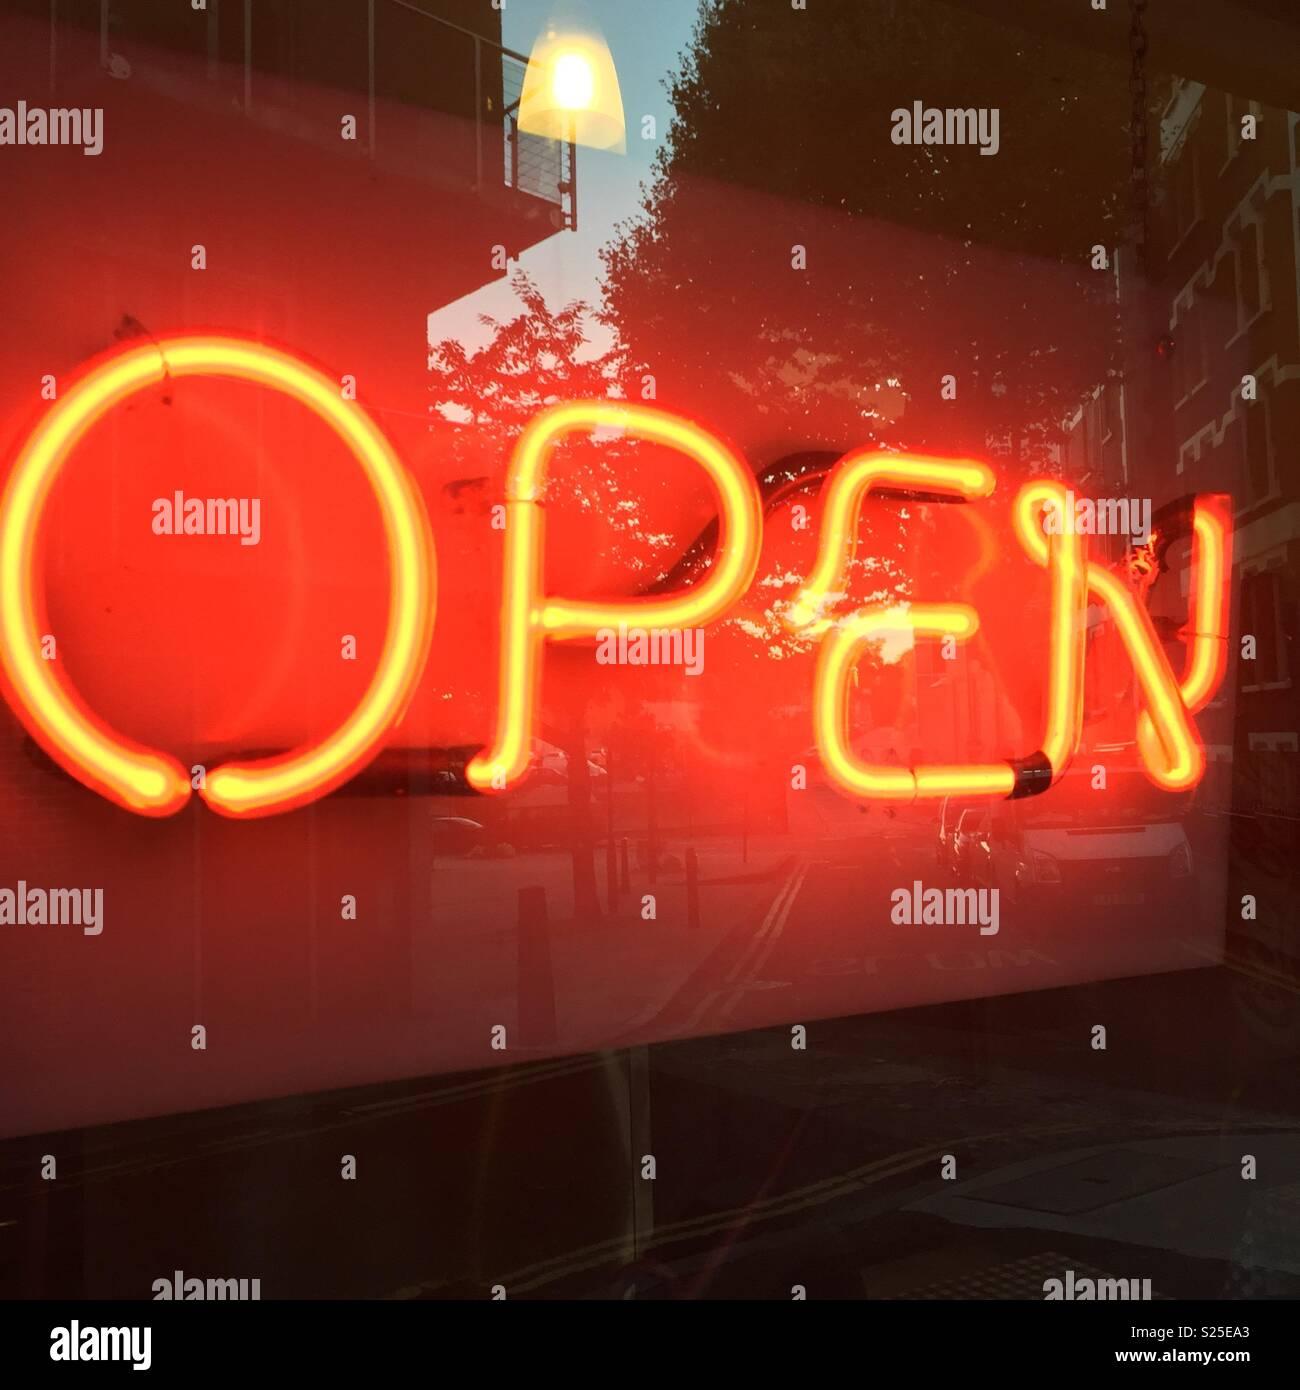 Open for Business Imagen De Stock